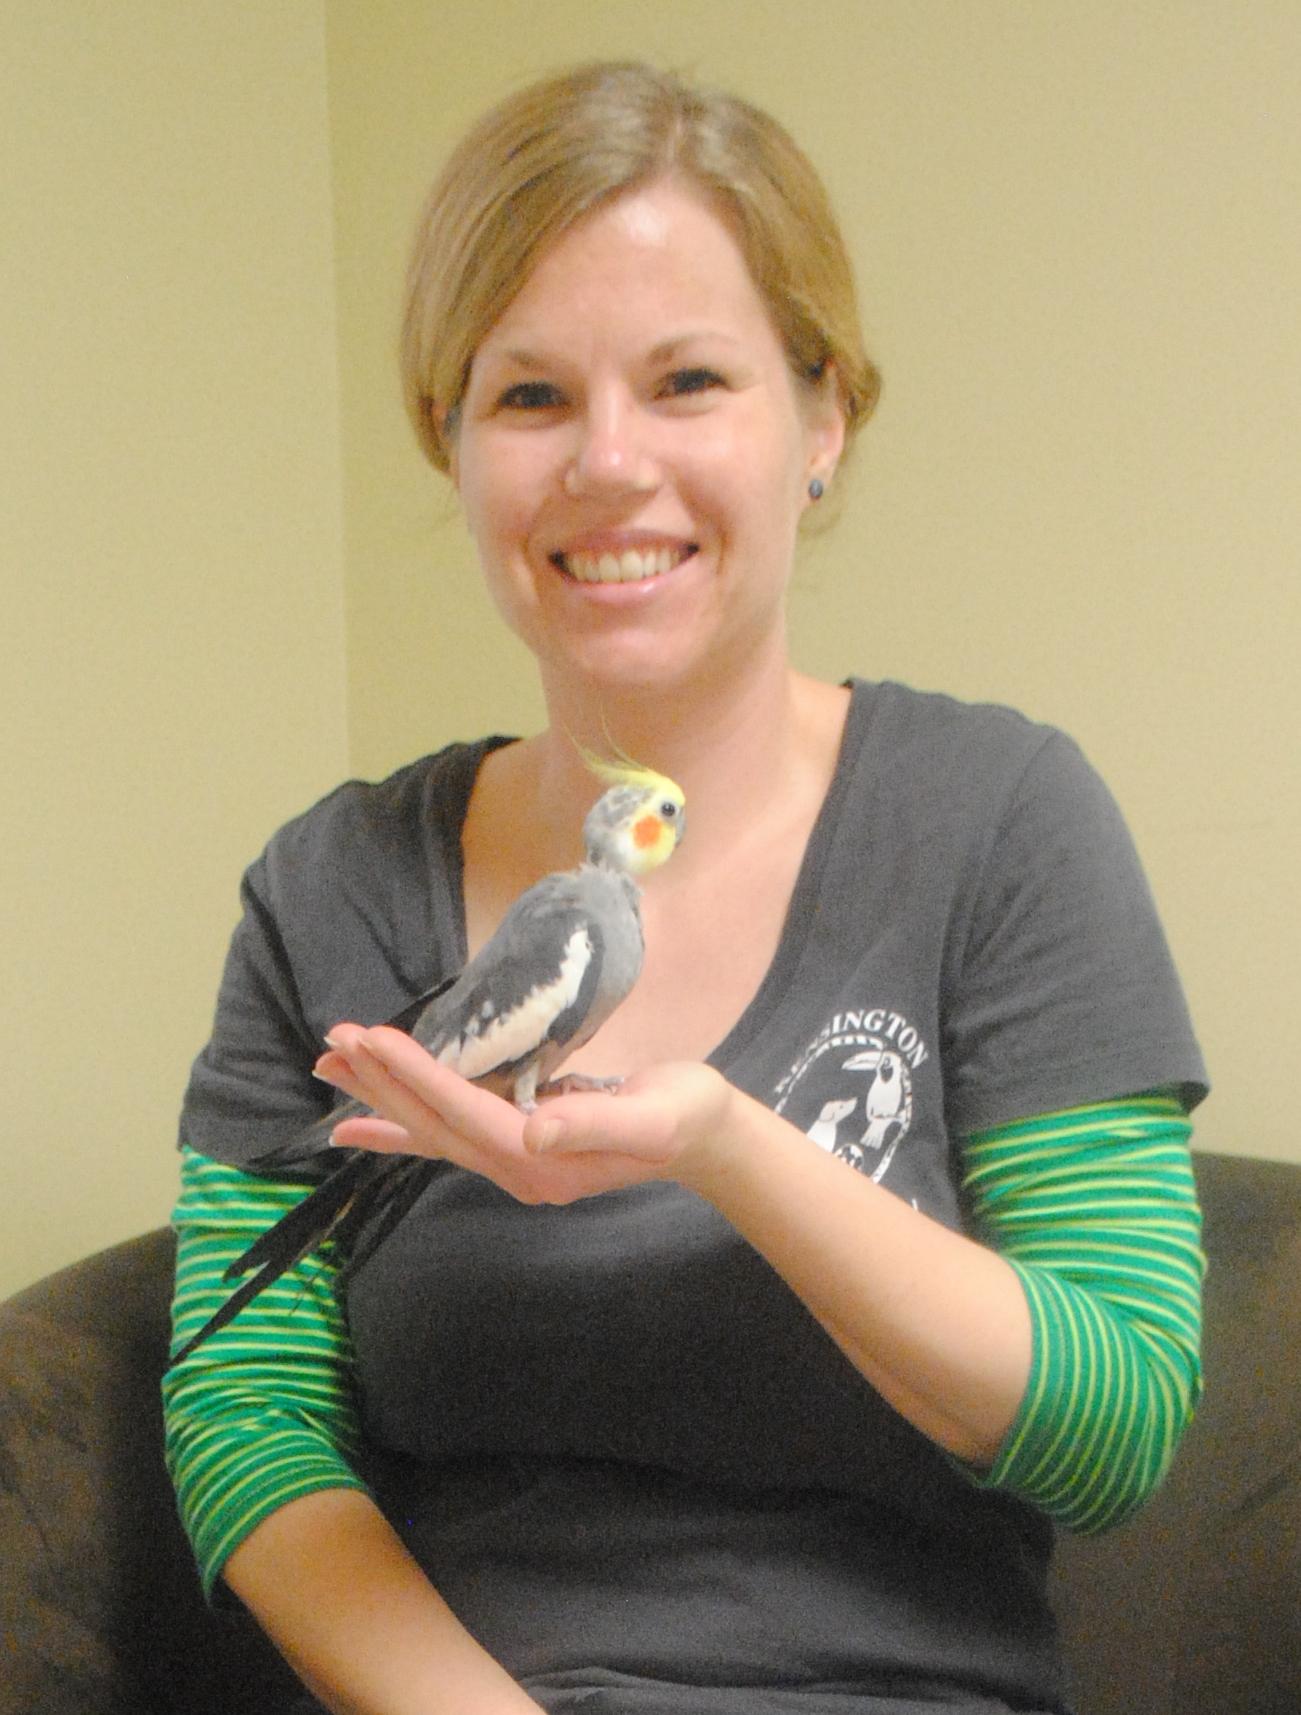 kensington bird and animal hospital veterinarians and staff shellie lusas